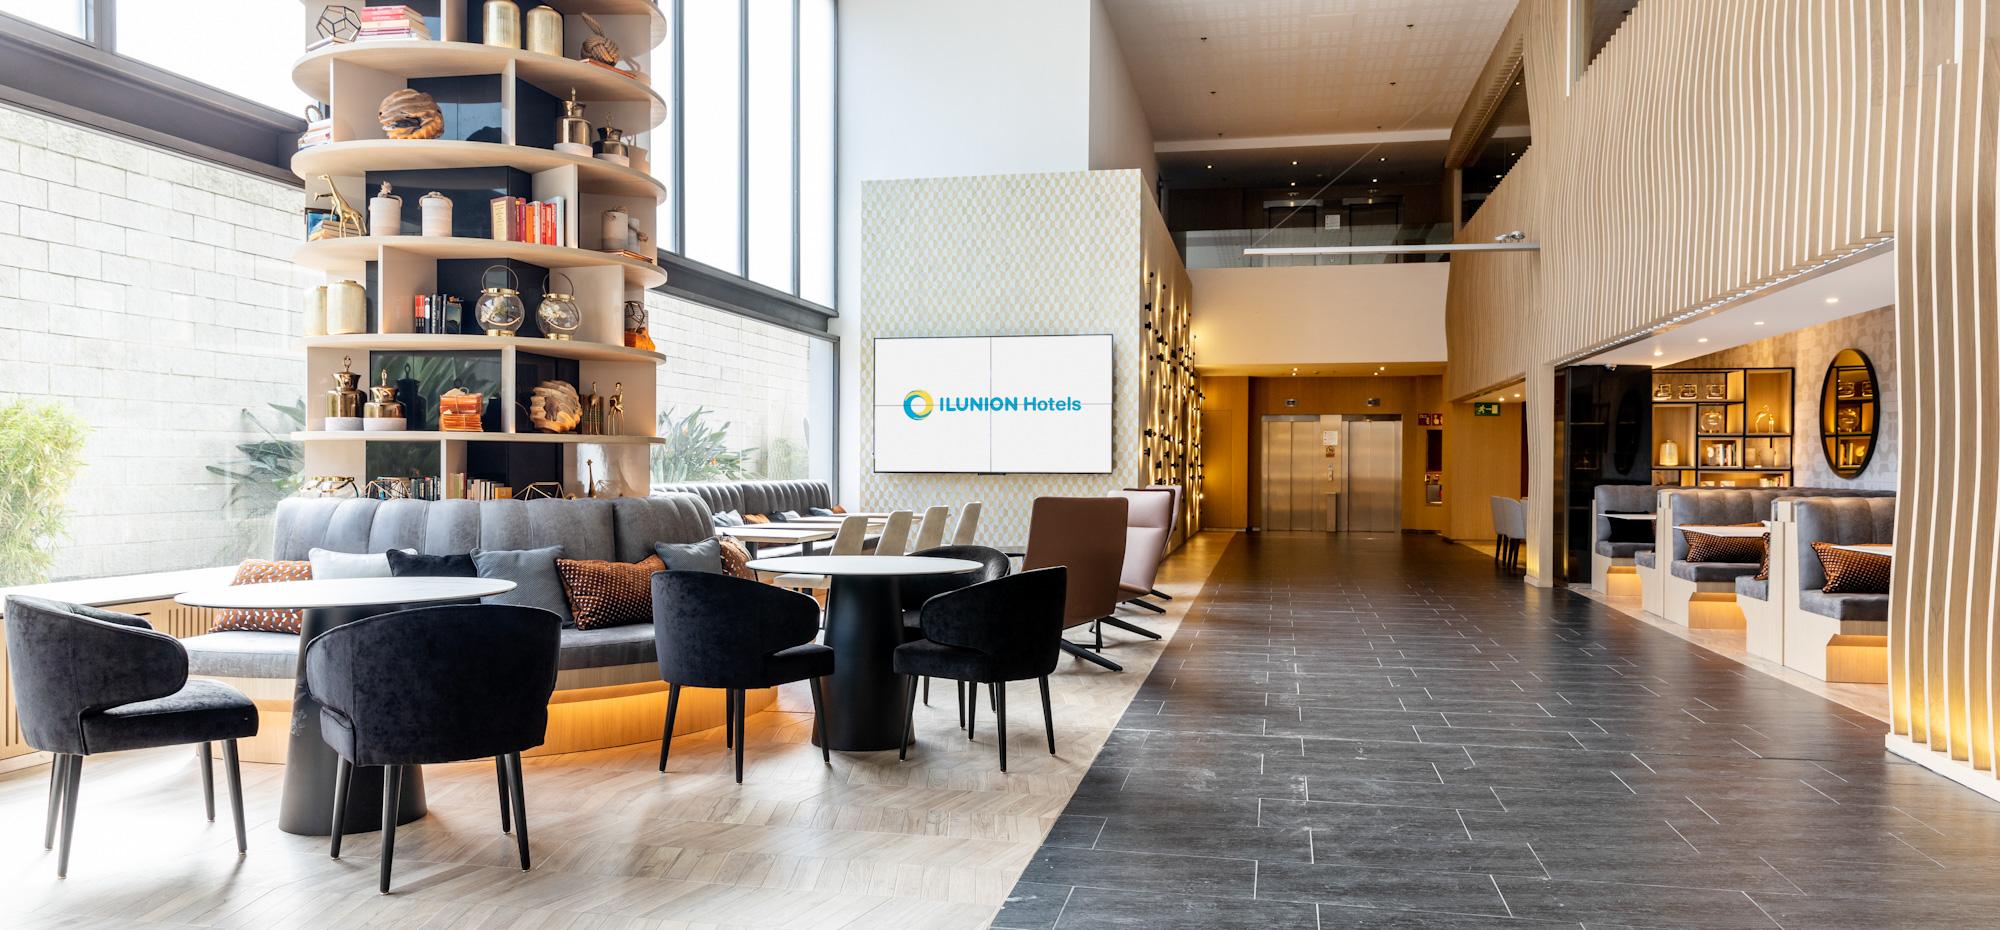 Ilunion finaliza la reforma de tres hoteles